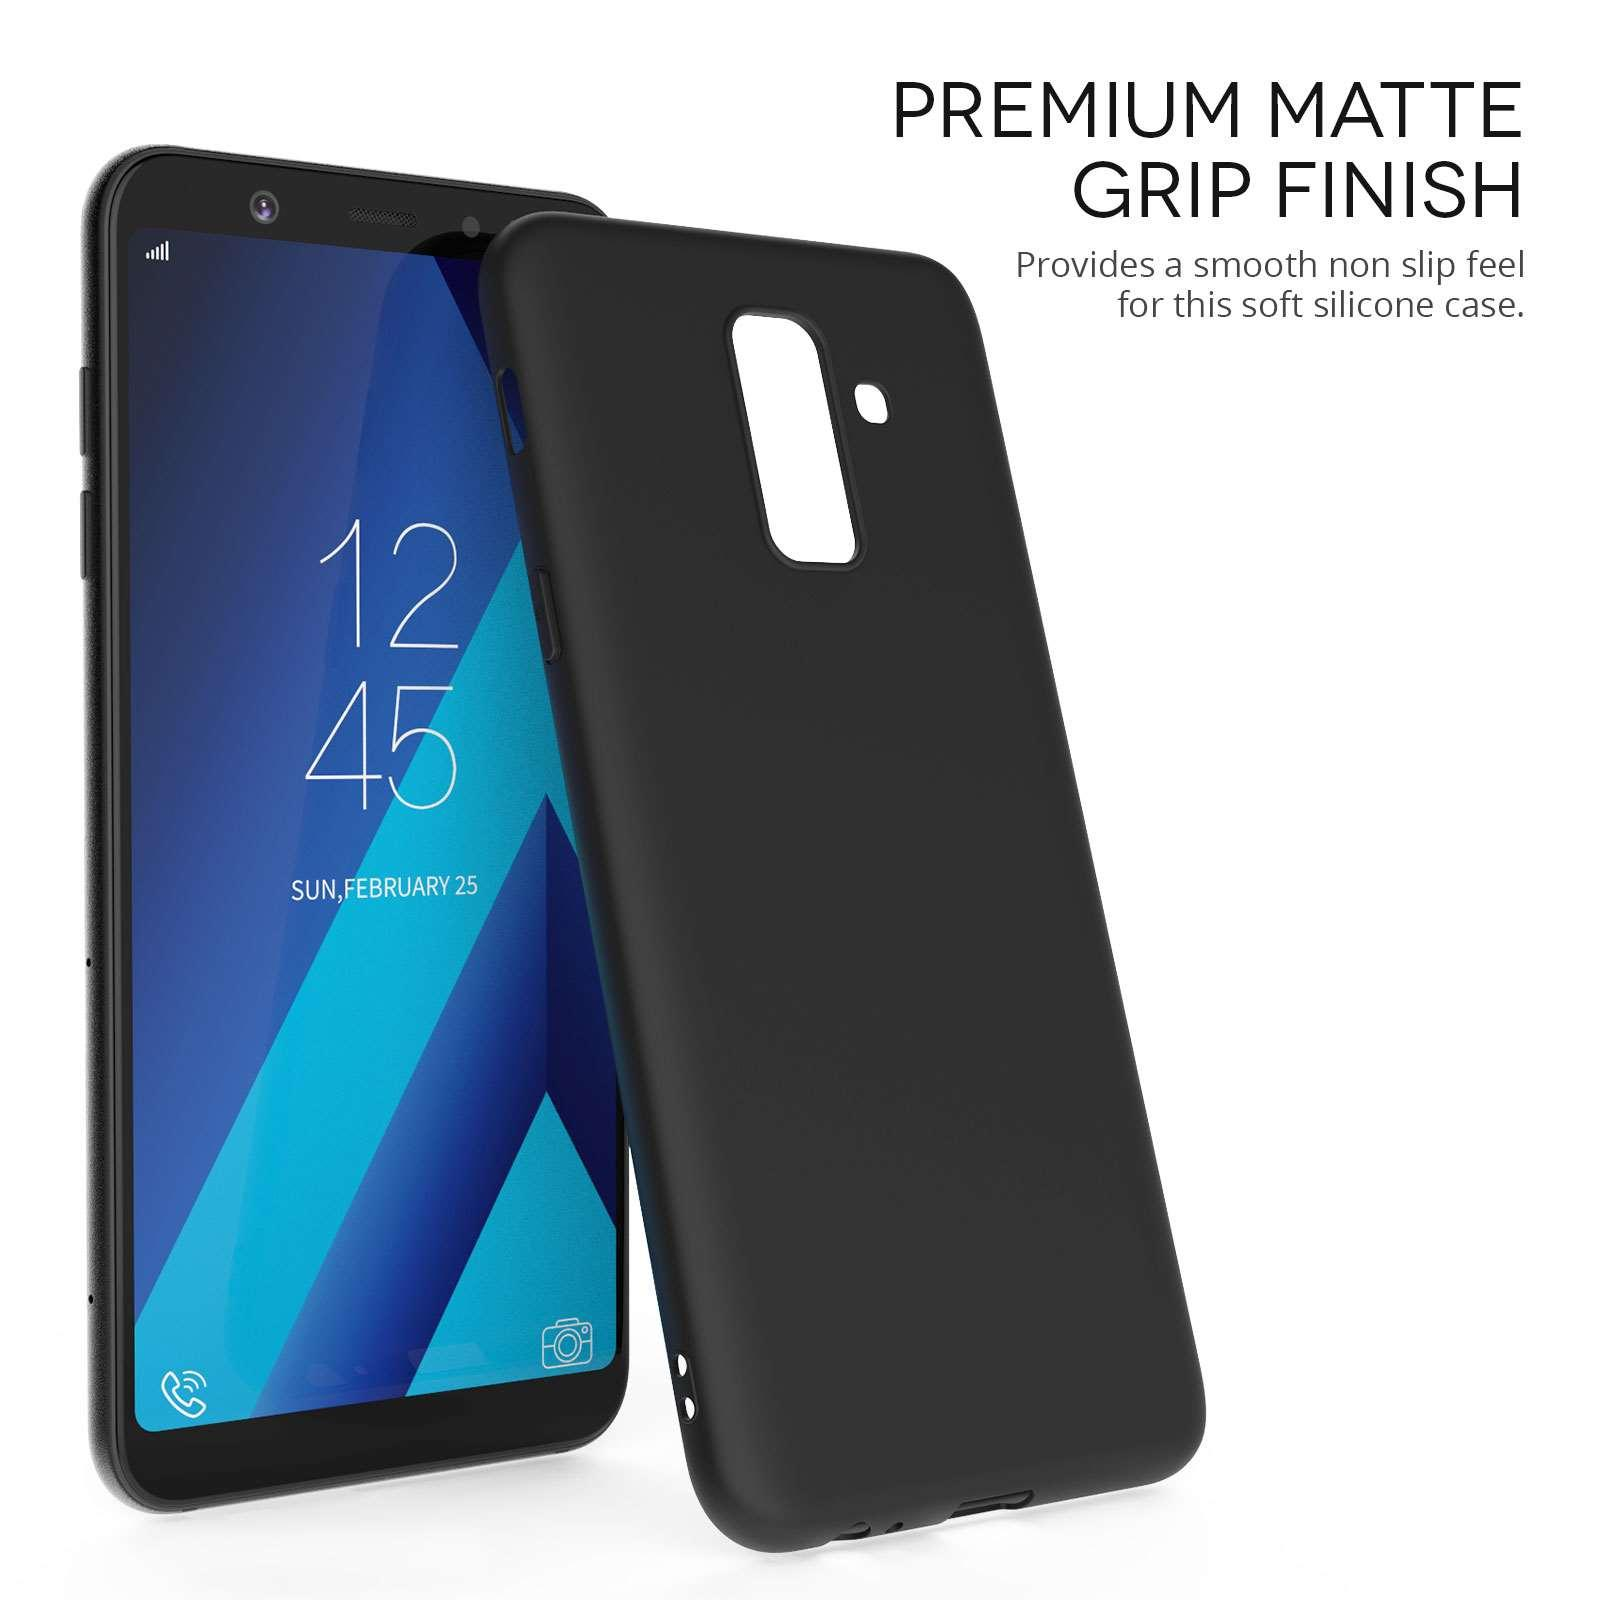 Kelebihan Caselova Ultraslim Black Matte Hybrid Case For Samsung Ovaltine Swiss Coklat Malt 1 Kg Import Reg Bpom Ri Galaxy A6 Plus 2018 Gratis